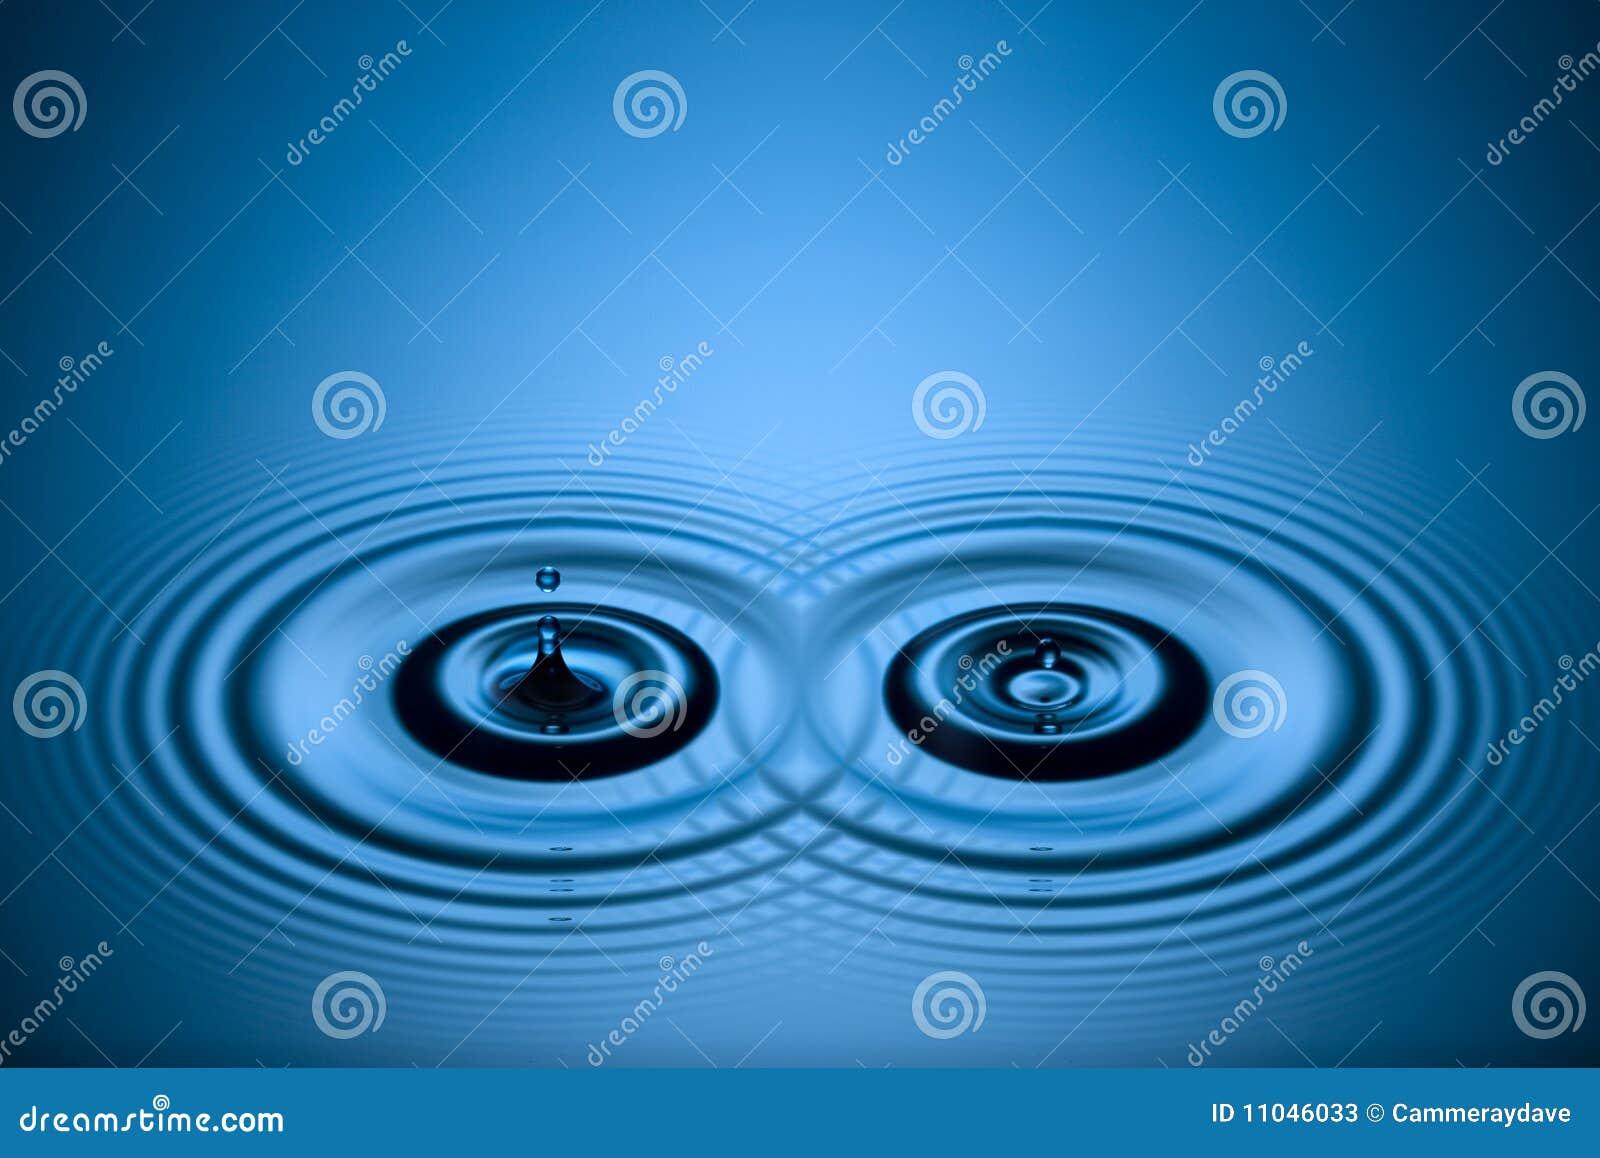 Water Drops Ripples